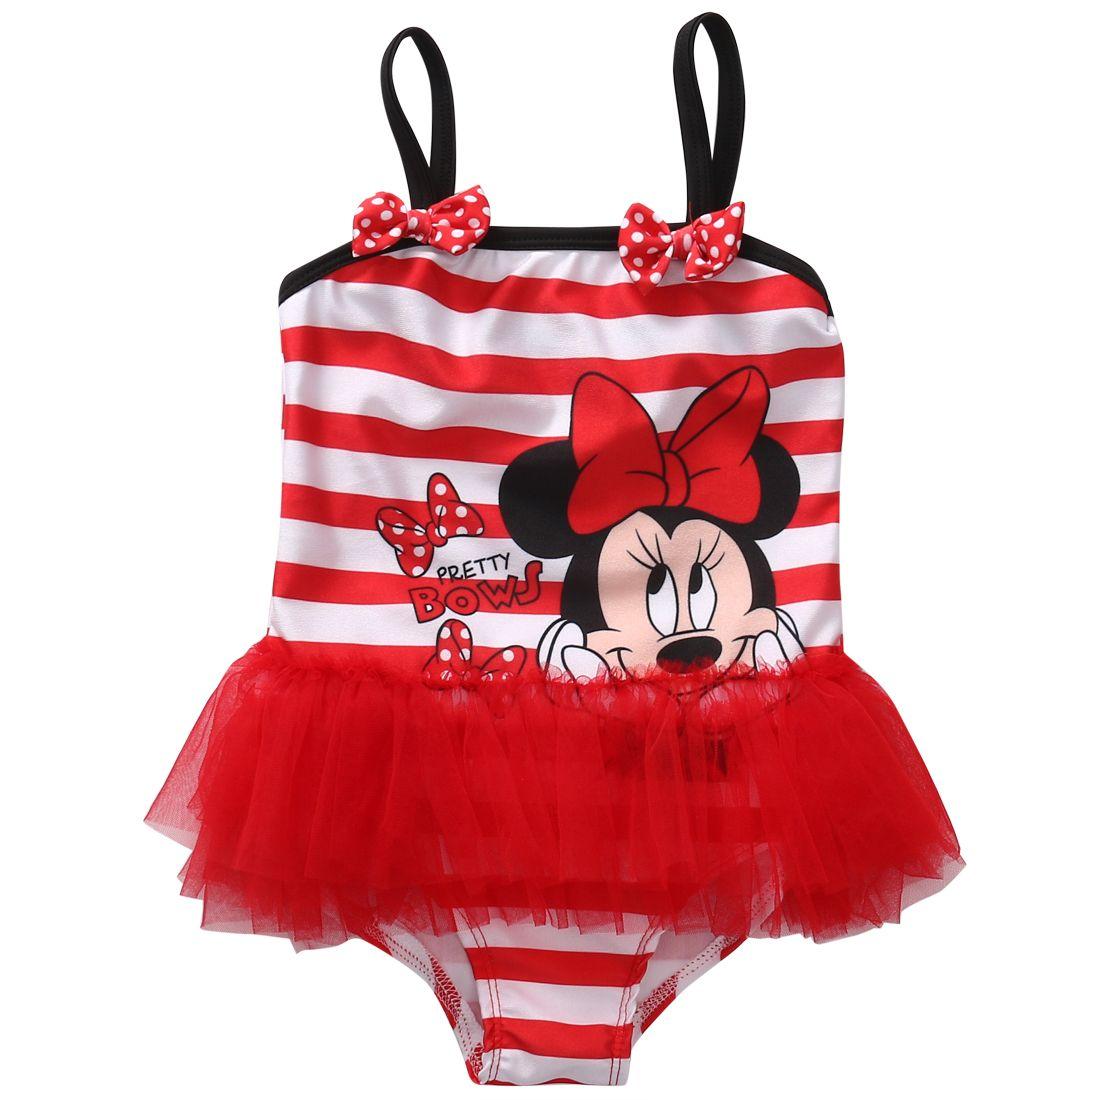 07e63516eaf88 Toddler Kids Baby Girls Tutu Swimsuit Skirt One Piece Swimsuit Summer  Swimwear #Affiliate